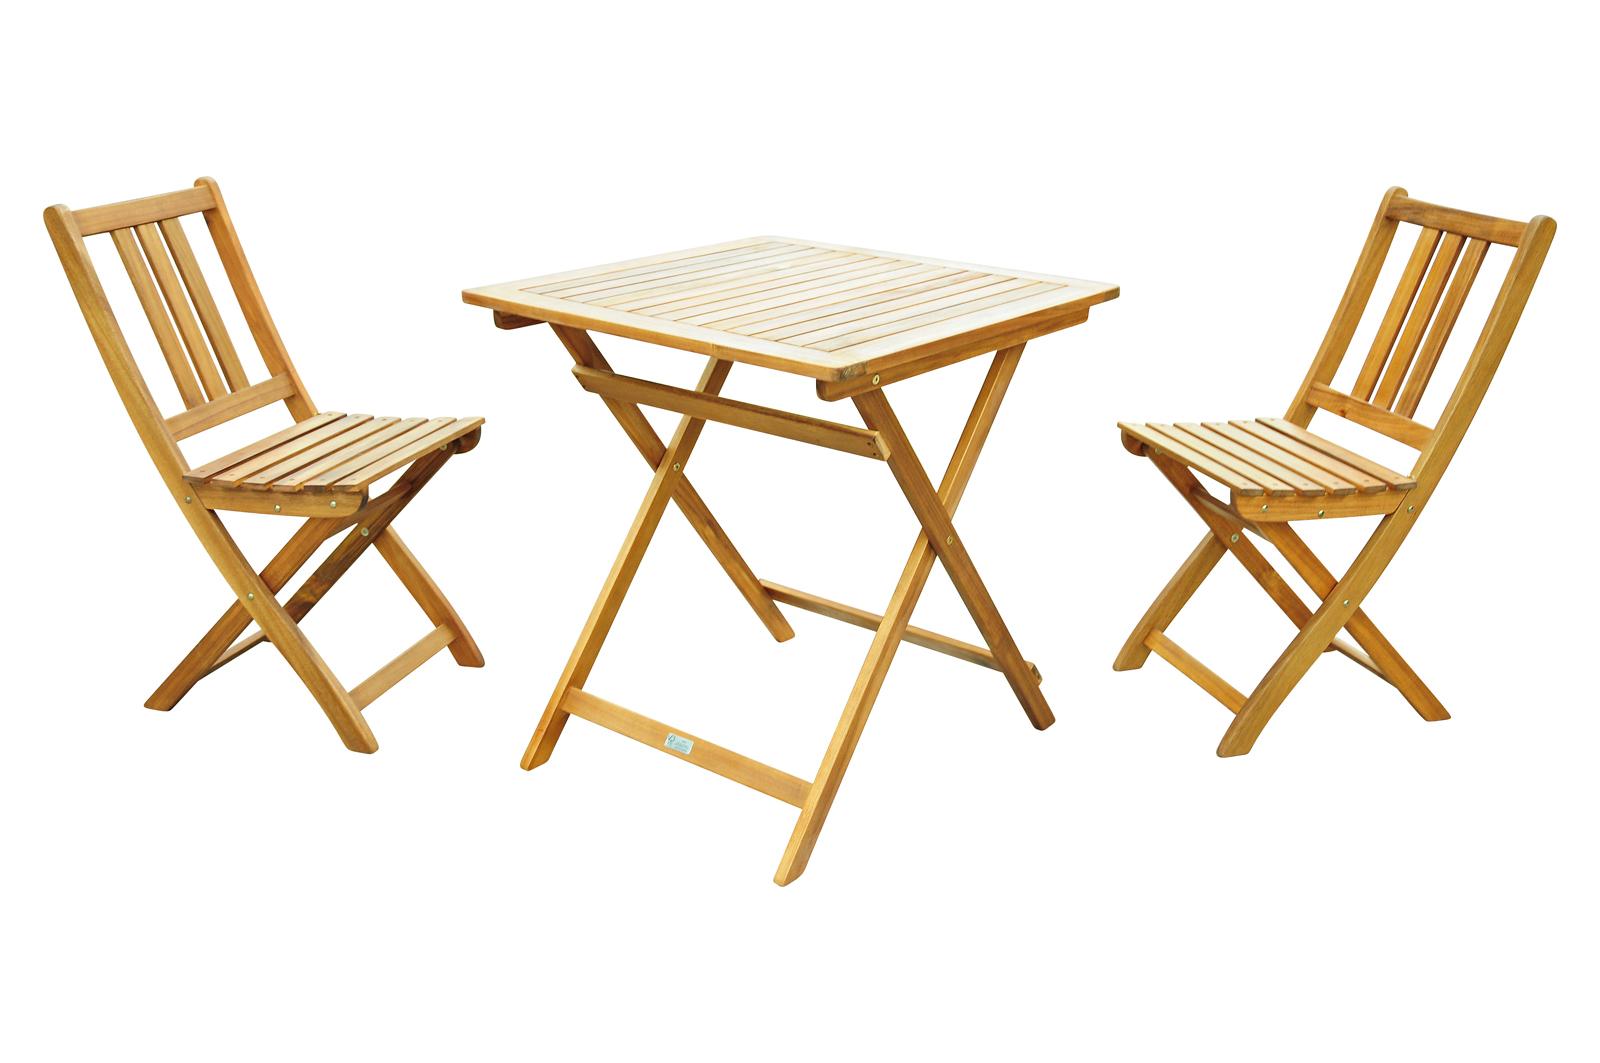 sam balkonm bel set 3tlg tisch 70 x 70 cm akazie viby farso demn chst. Black Bedroom Furniture Sets. Home Design Ideas